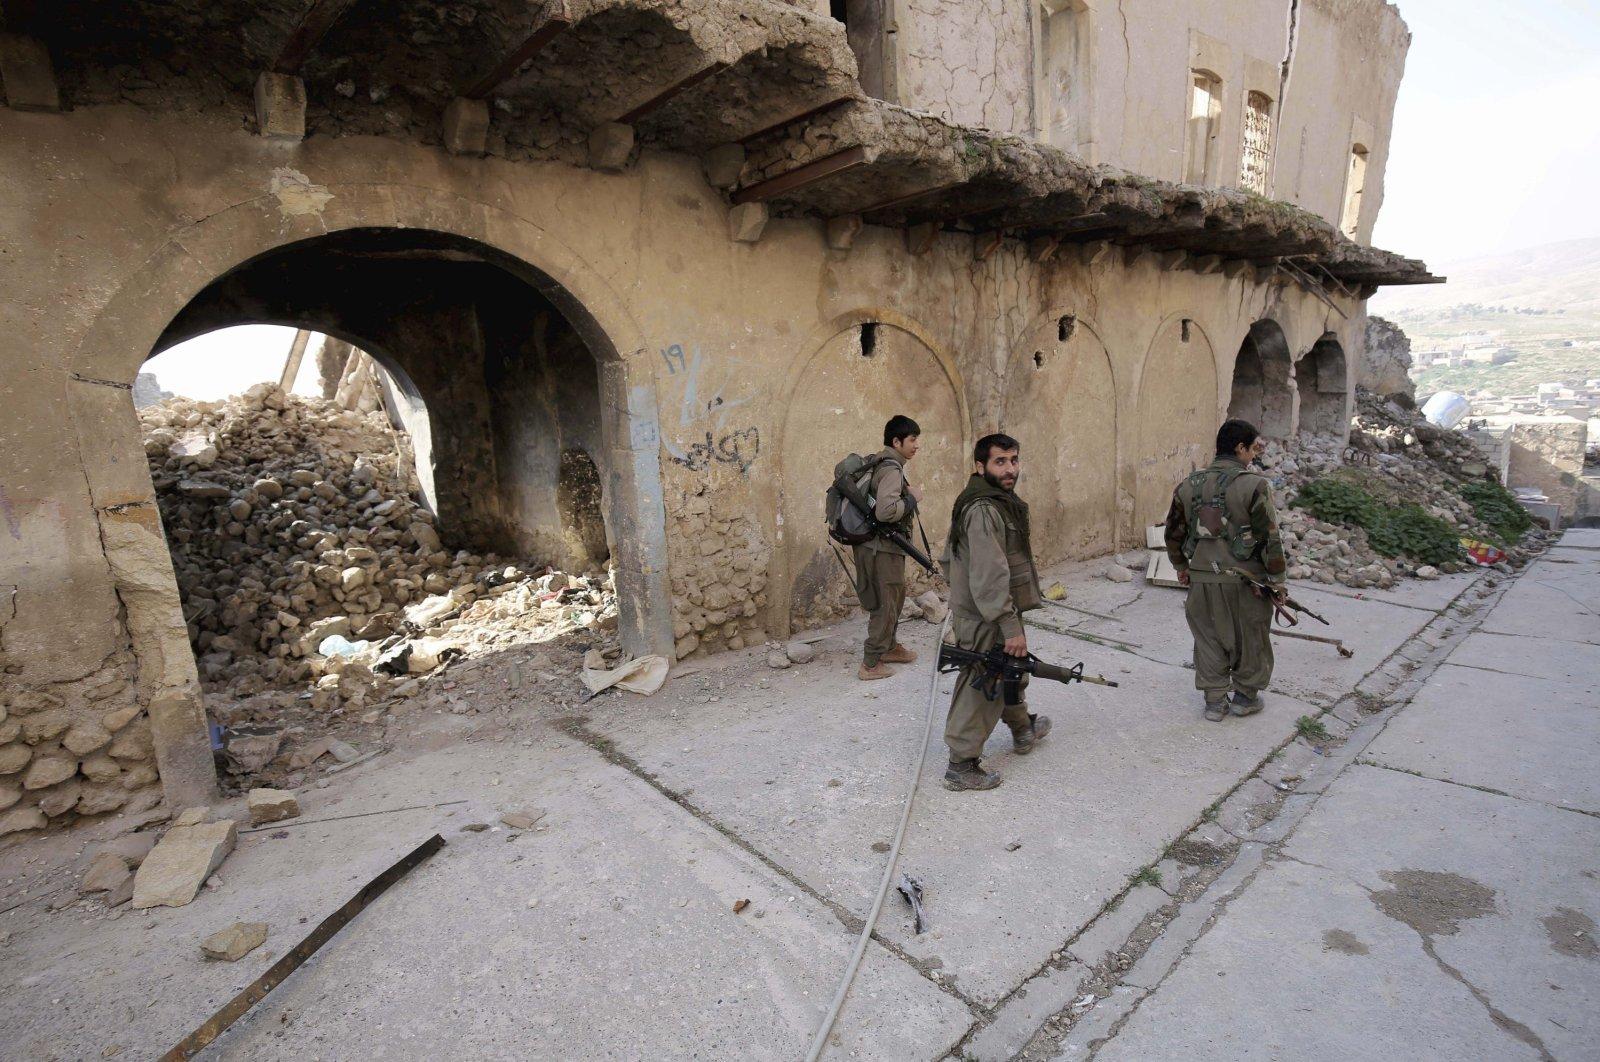 PKK terrorists walk along the damaged streets of Sinjar, Iraq, Jan. 29, 2015. (AP File Photo)